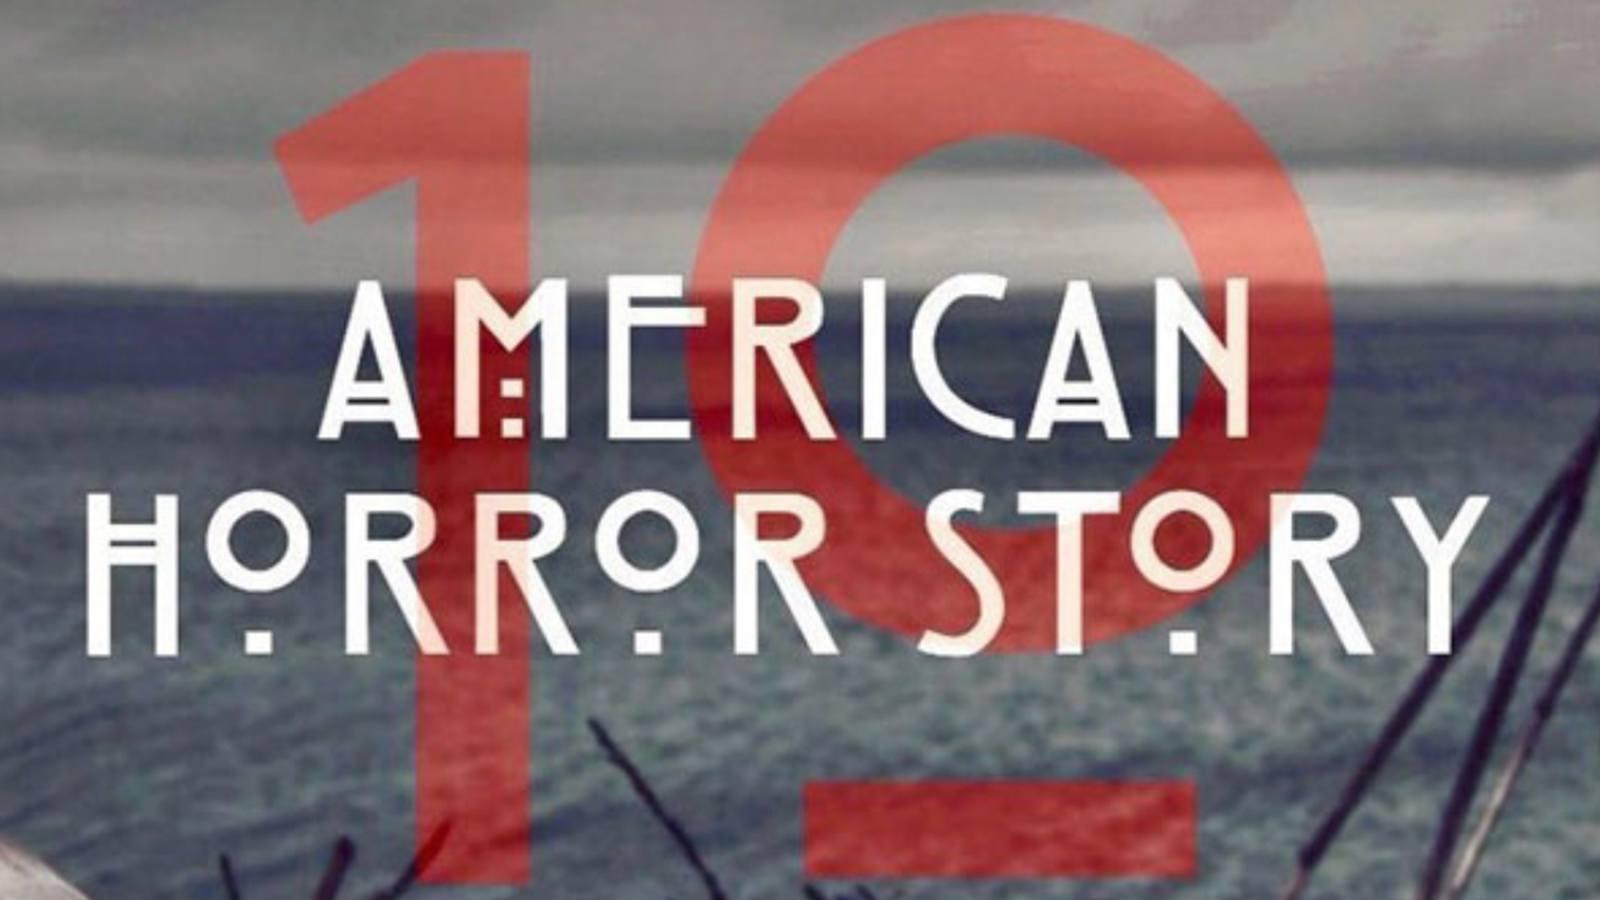 Saison 10 d'American Horror Story